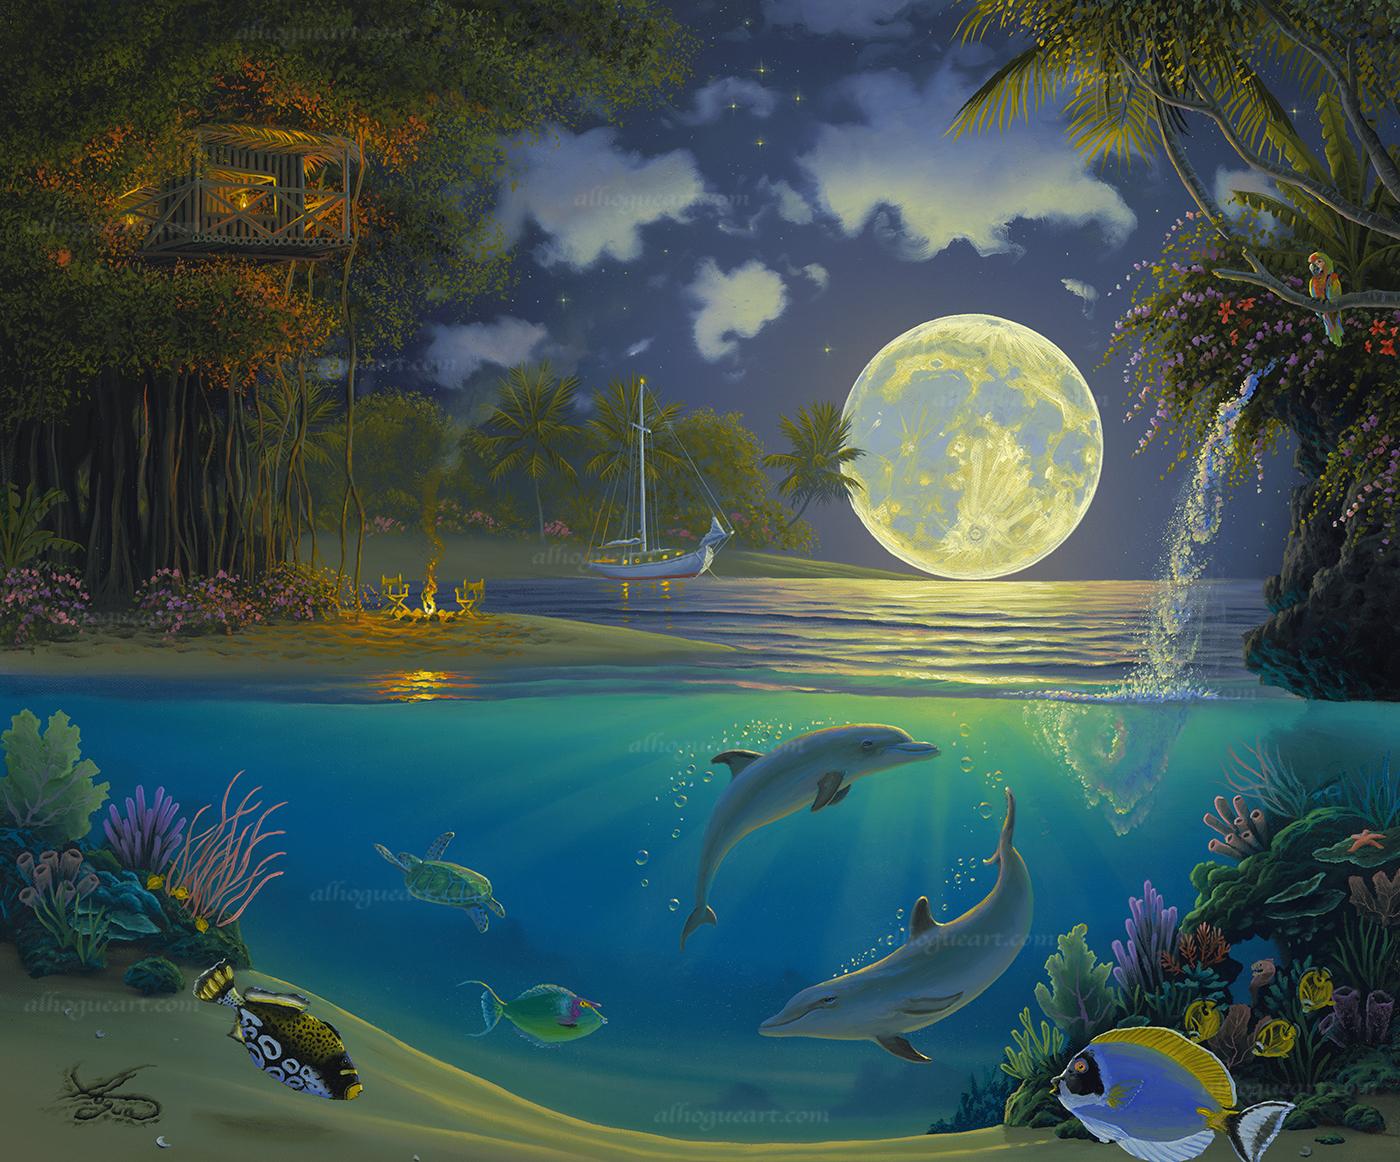 """Moonlit Symphony""  LSN 24X28.75 lithographs 1,500  SN 24X30 giclee 140  AC 30X37.5 giclee 120  MC 36X45 giclee 75  Total 1,835"